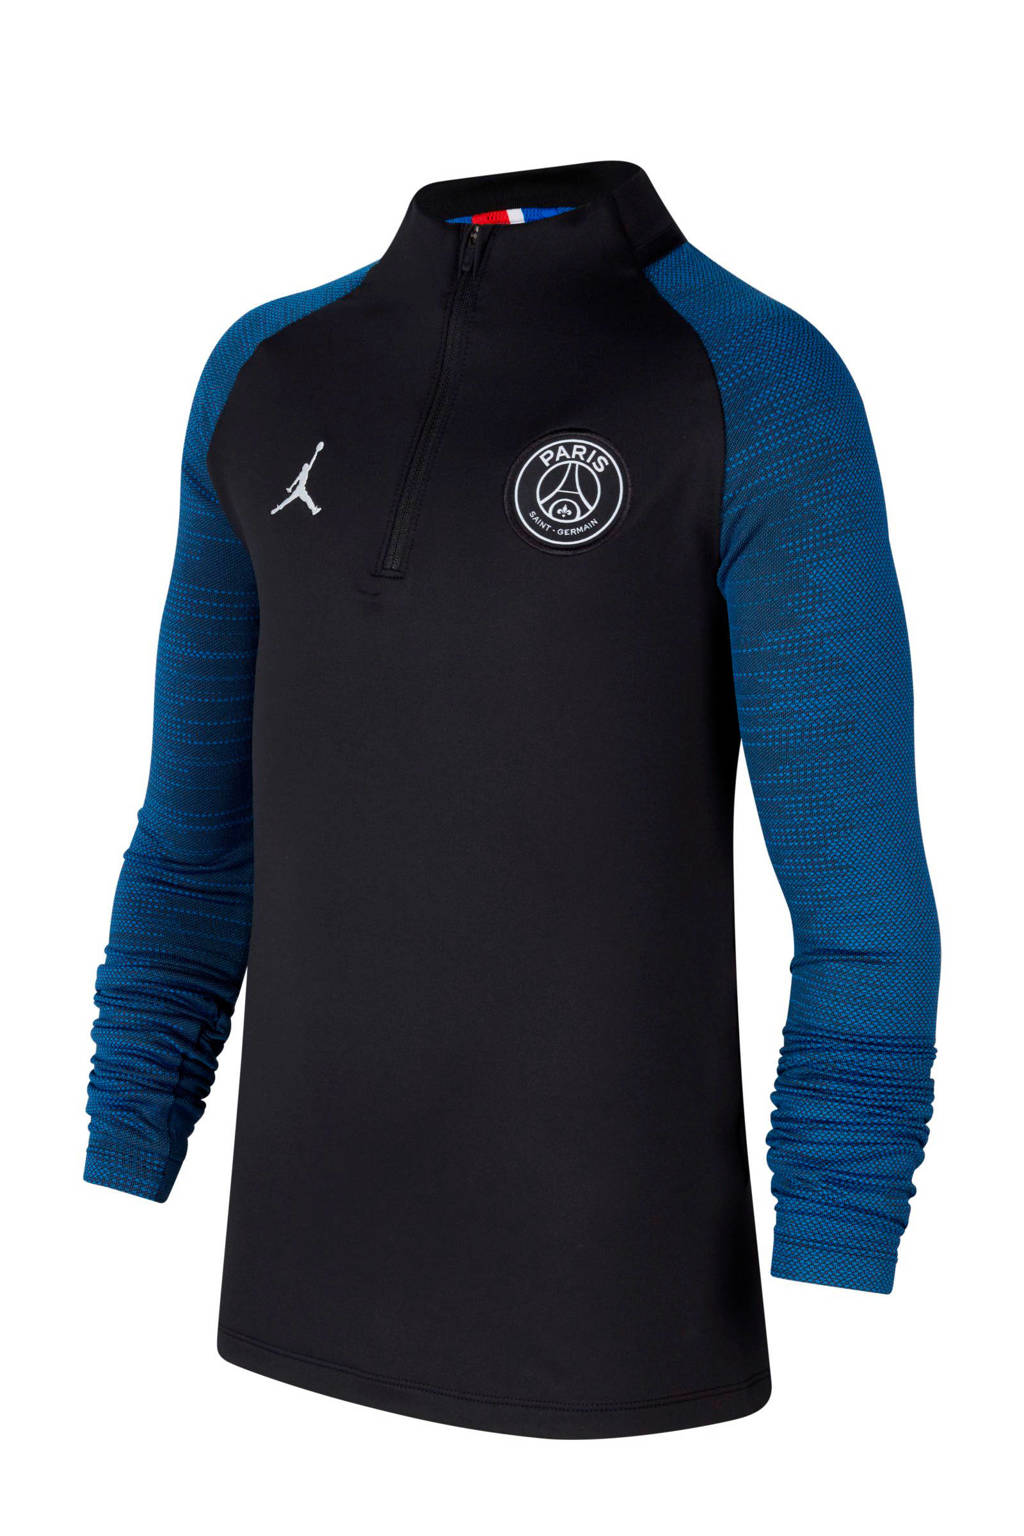 Nike Junior Paris Saint Germain x Jordan voetbalshirt, Zwart/blauw